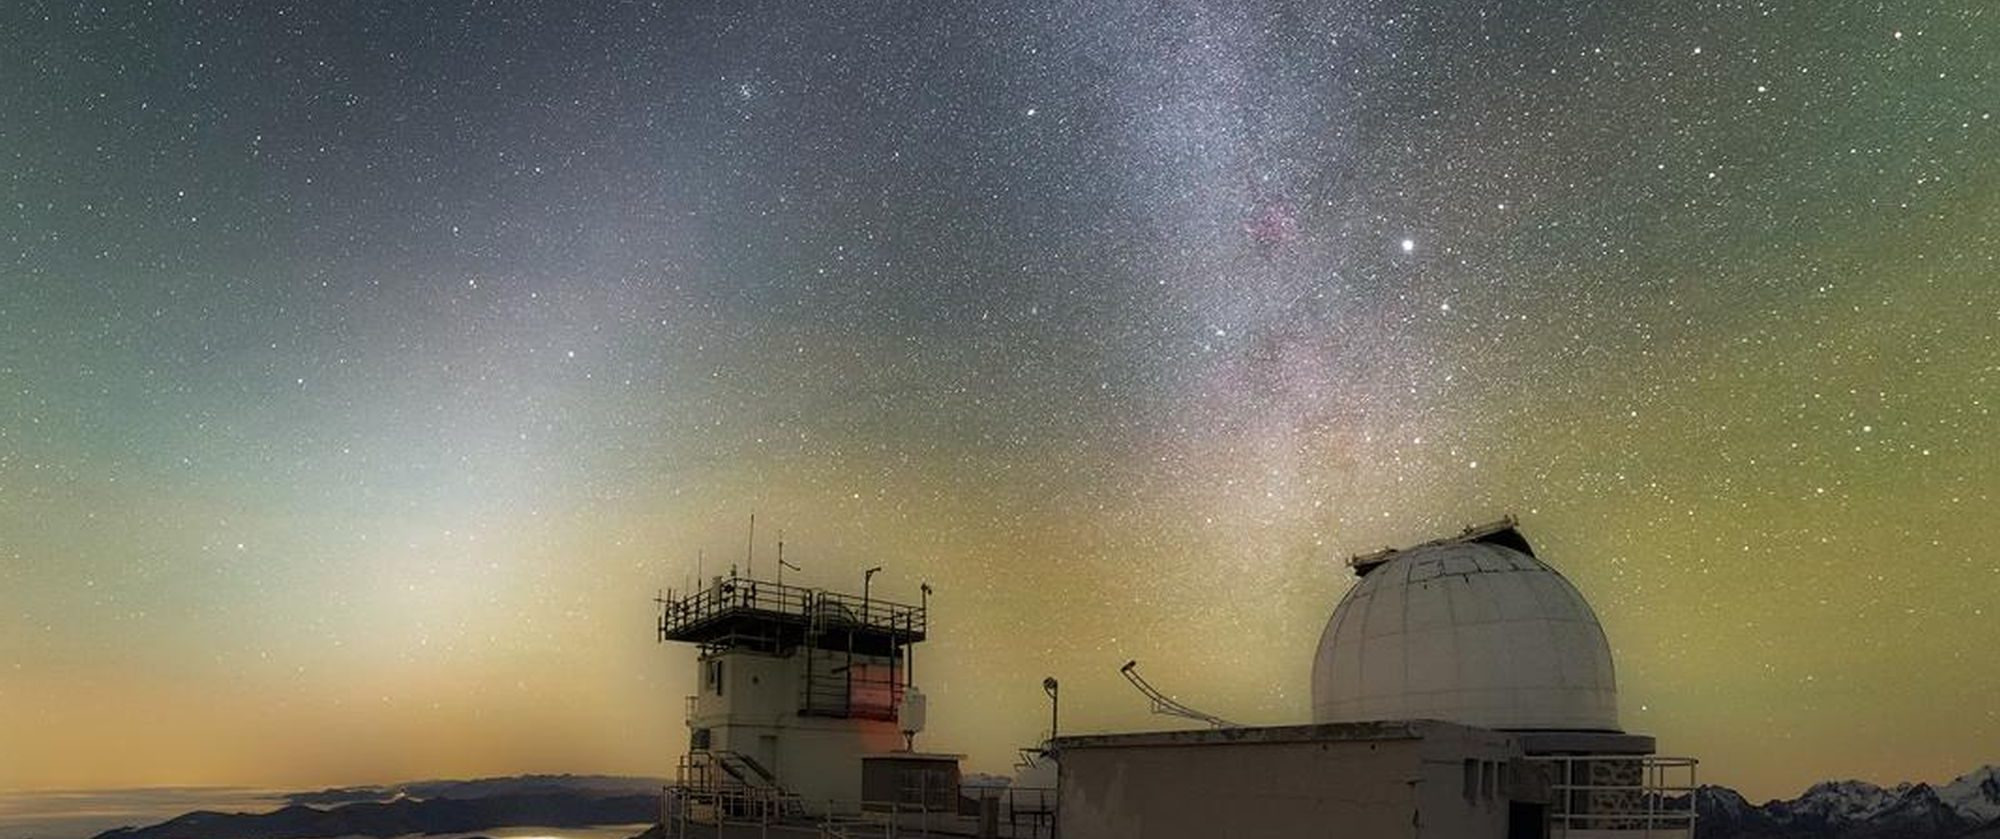 CoAstro: um condomínio de Astronomi@